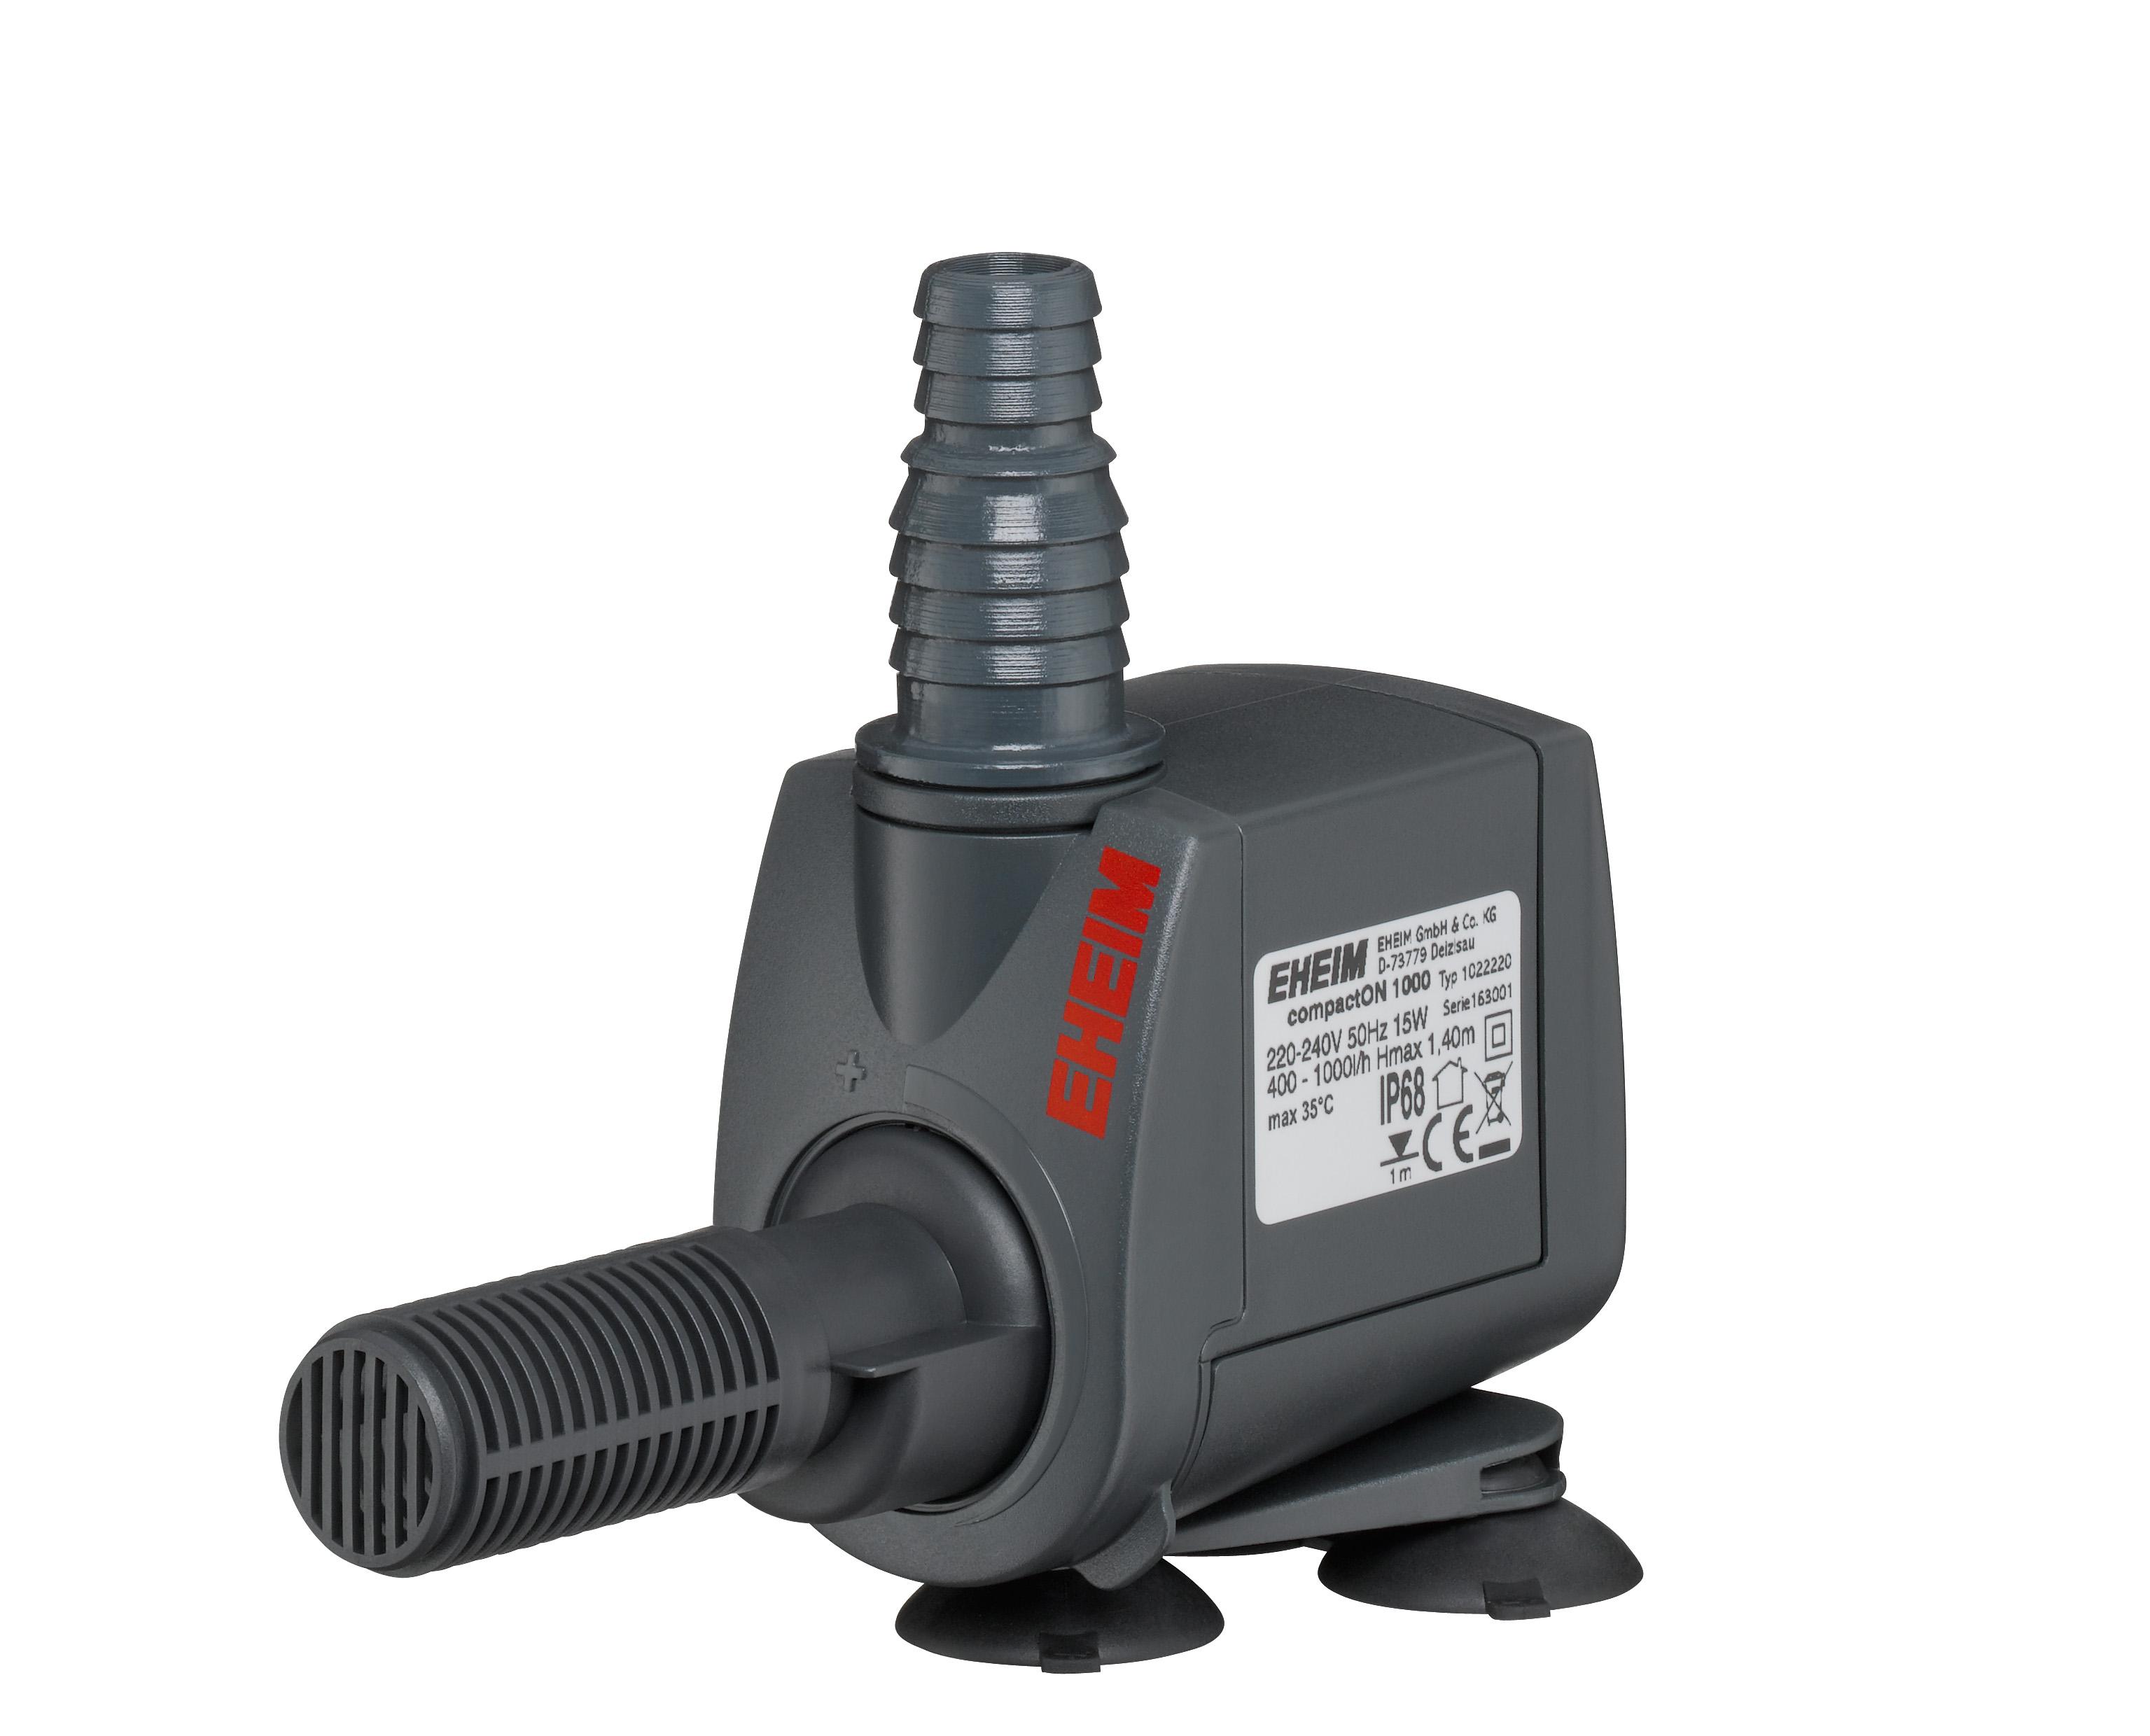 EHEIM GmbH amp; Co. KG EHEIM Čerpadlo CompactON 1000